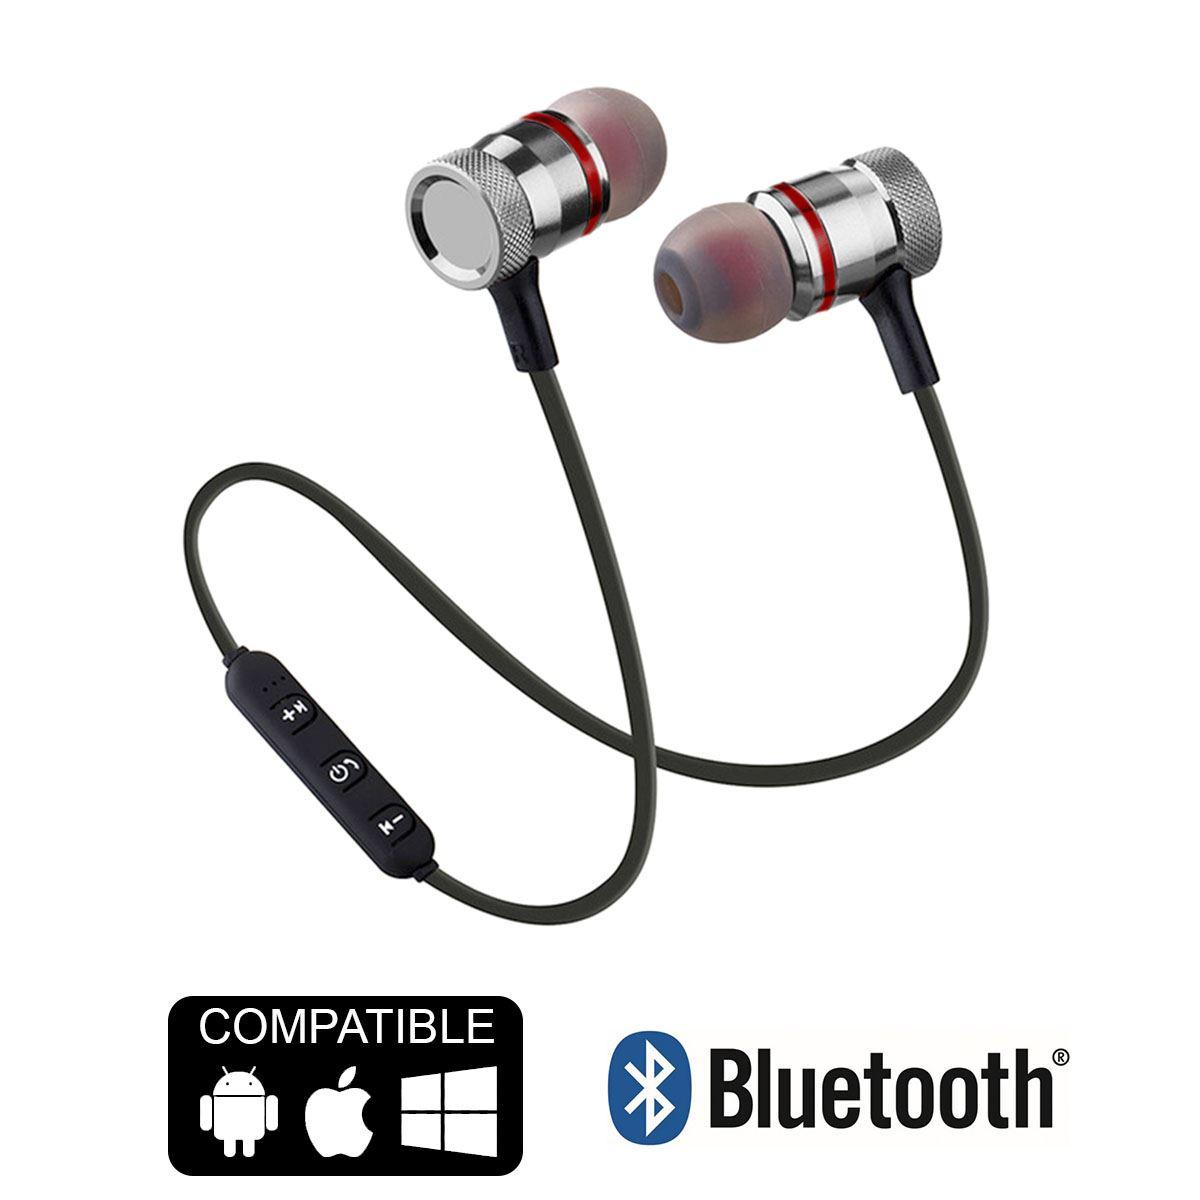 Auriculares-Bluetooth-4-1-Inalambricos-Magnetico-Microfono-Cascos-Deportivos miniatura 6